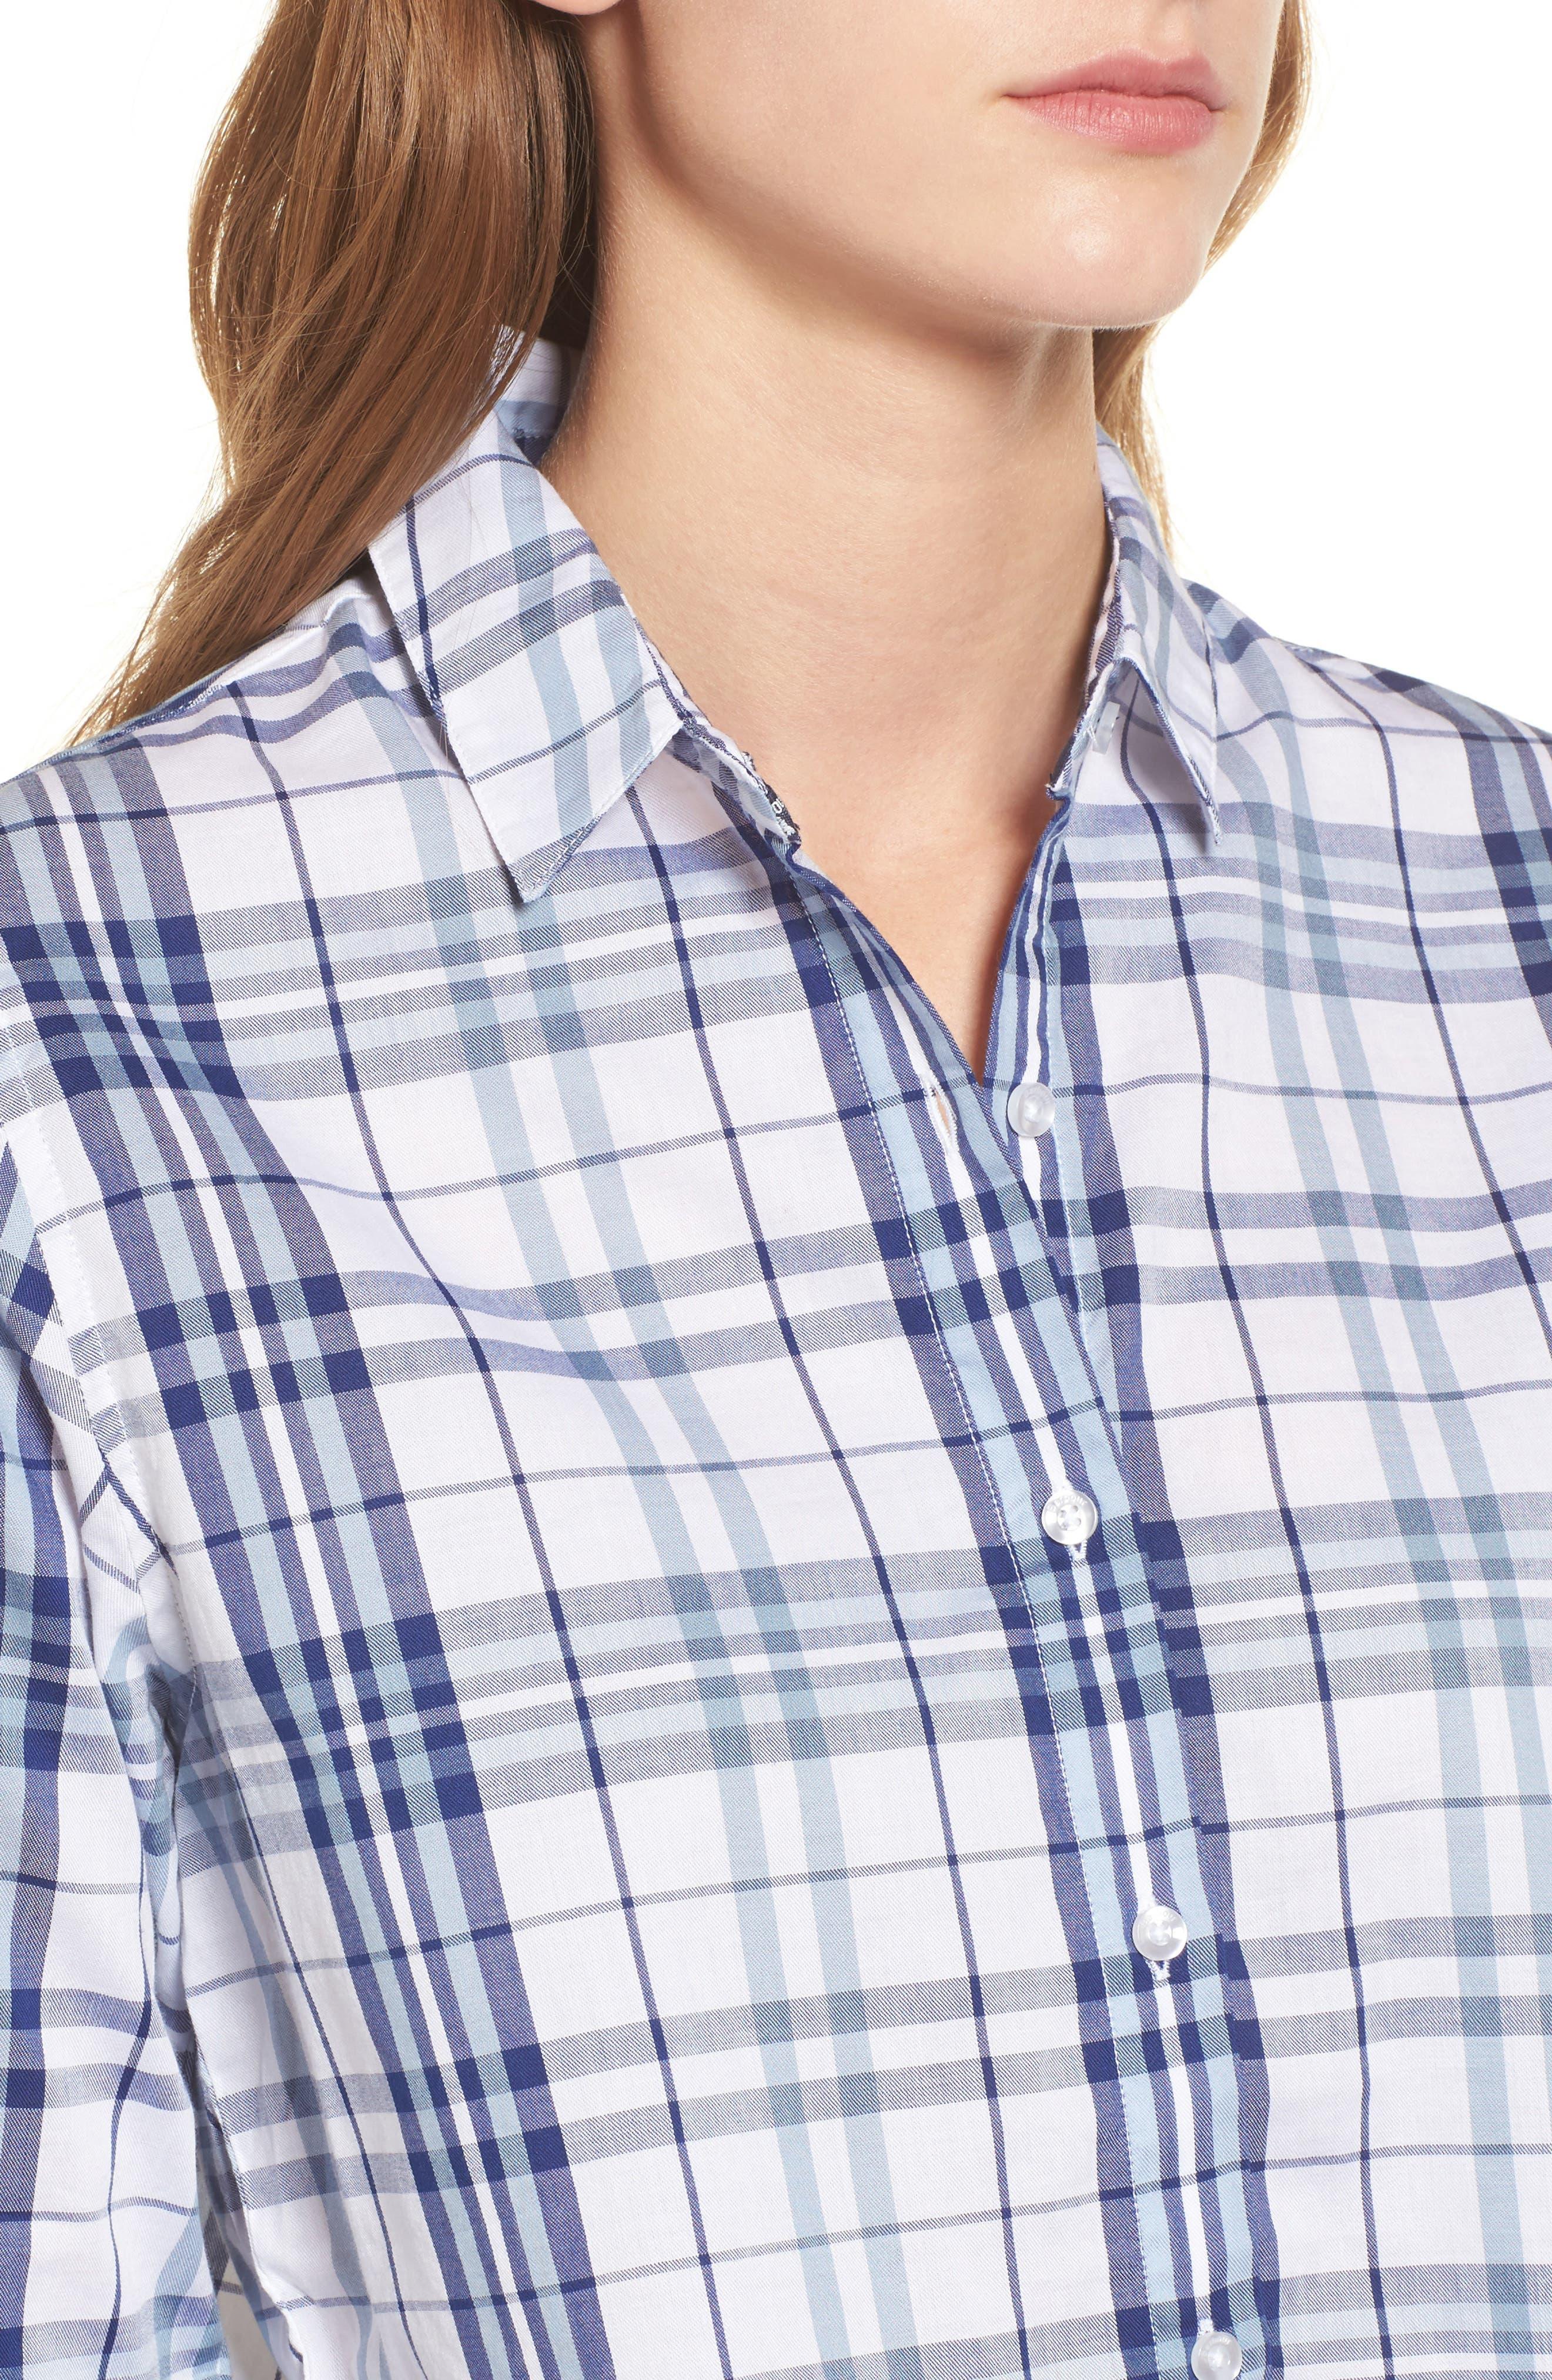 Selsey Plaid Shirt,                             Alternate thumbnail 4, color,                             White/ Coastal Blue